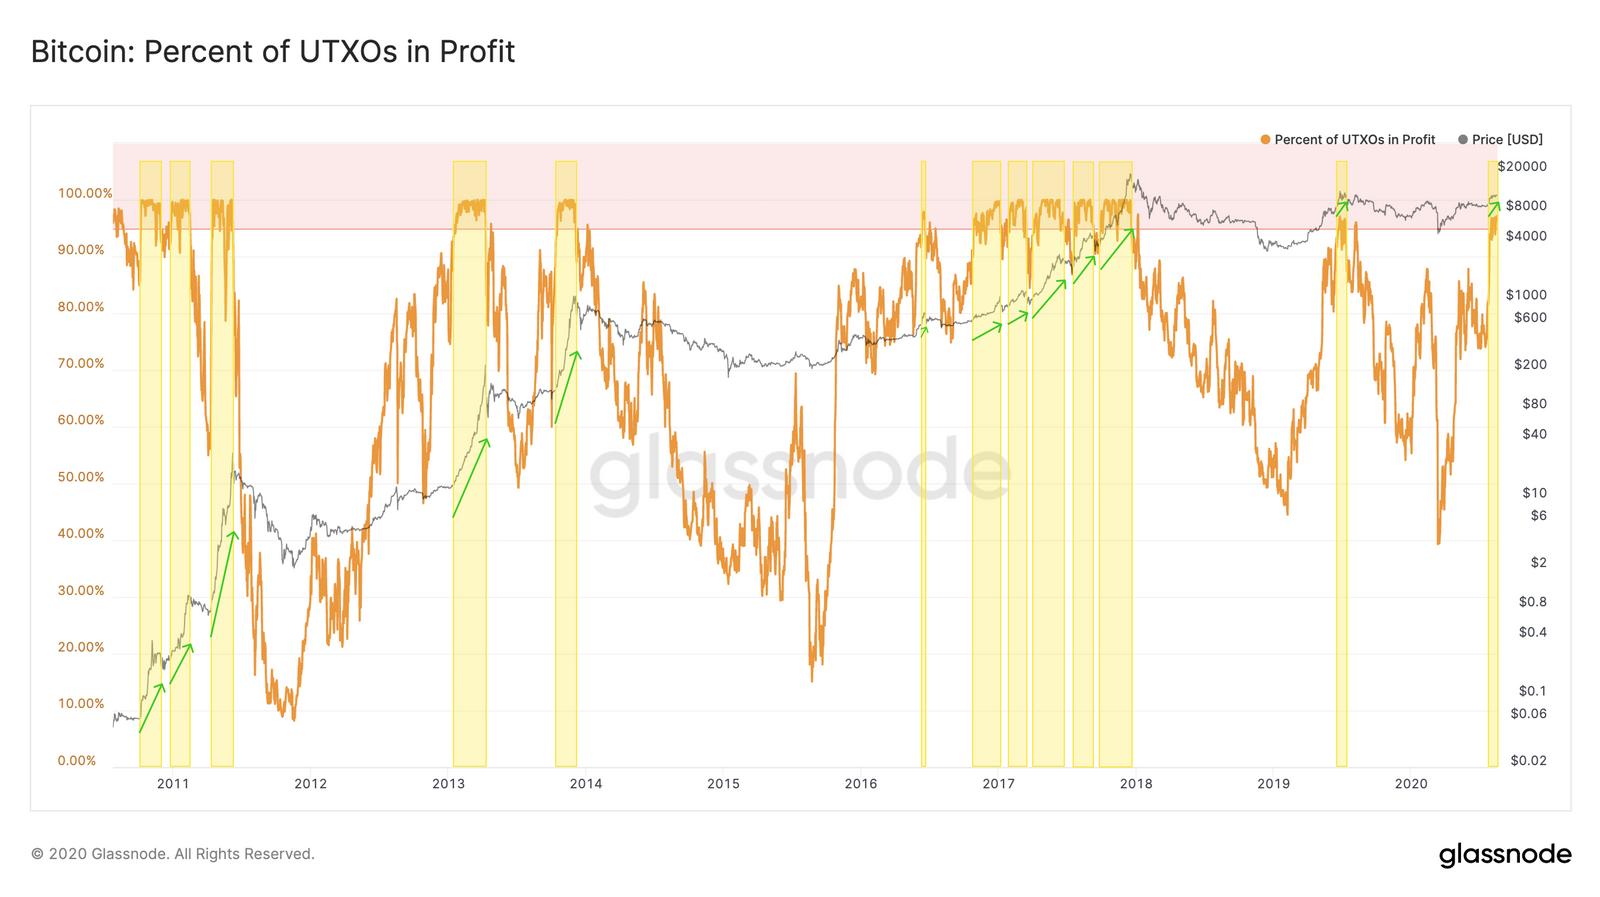 Bitcoin UTXO profitability chart